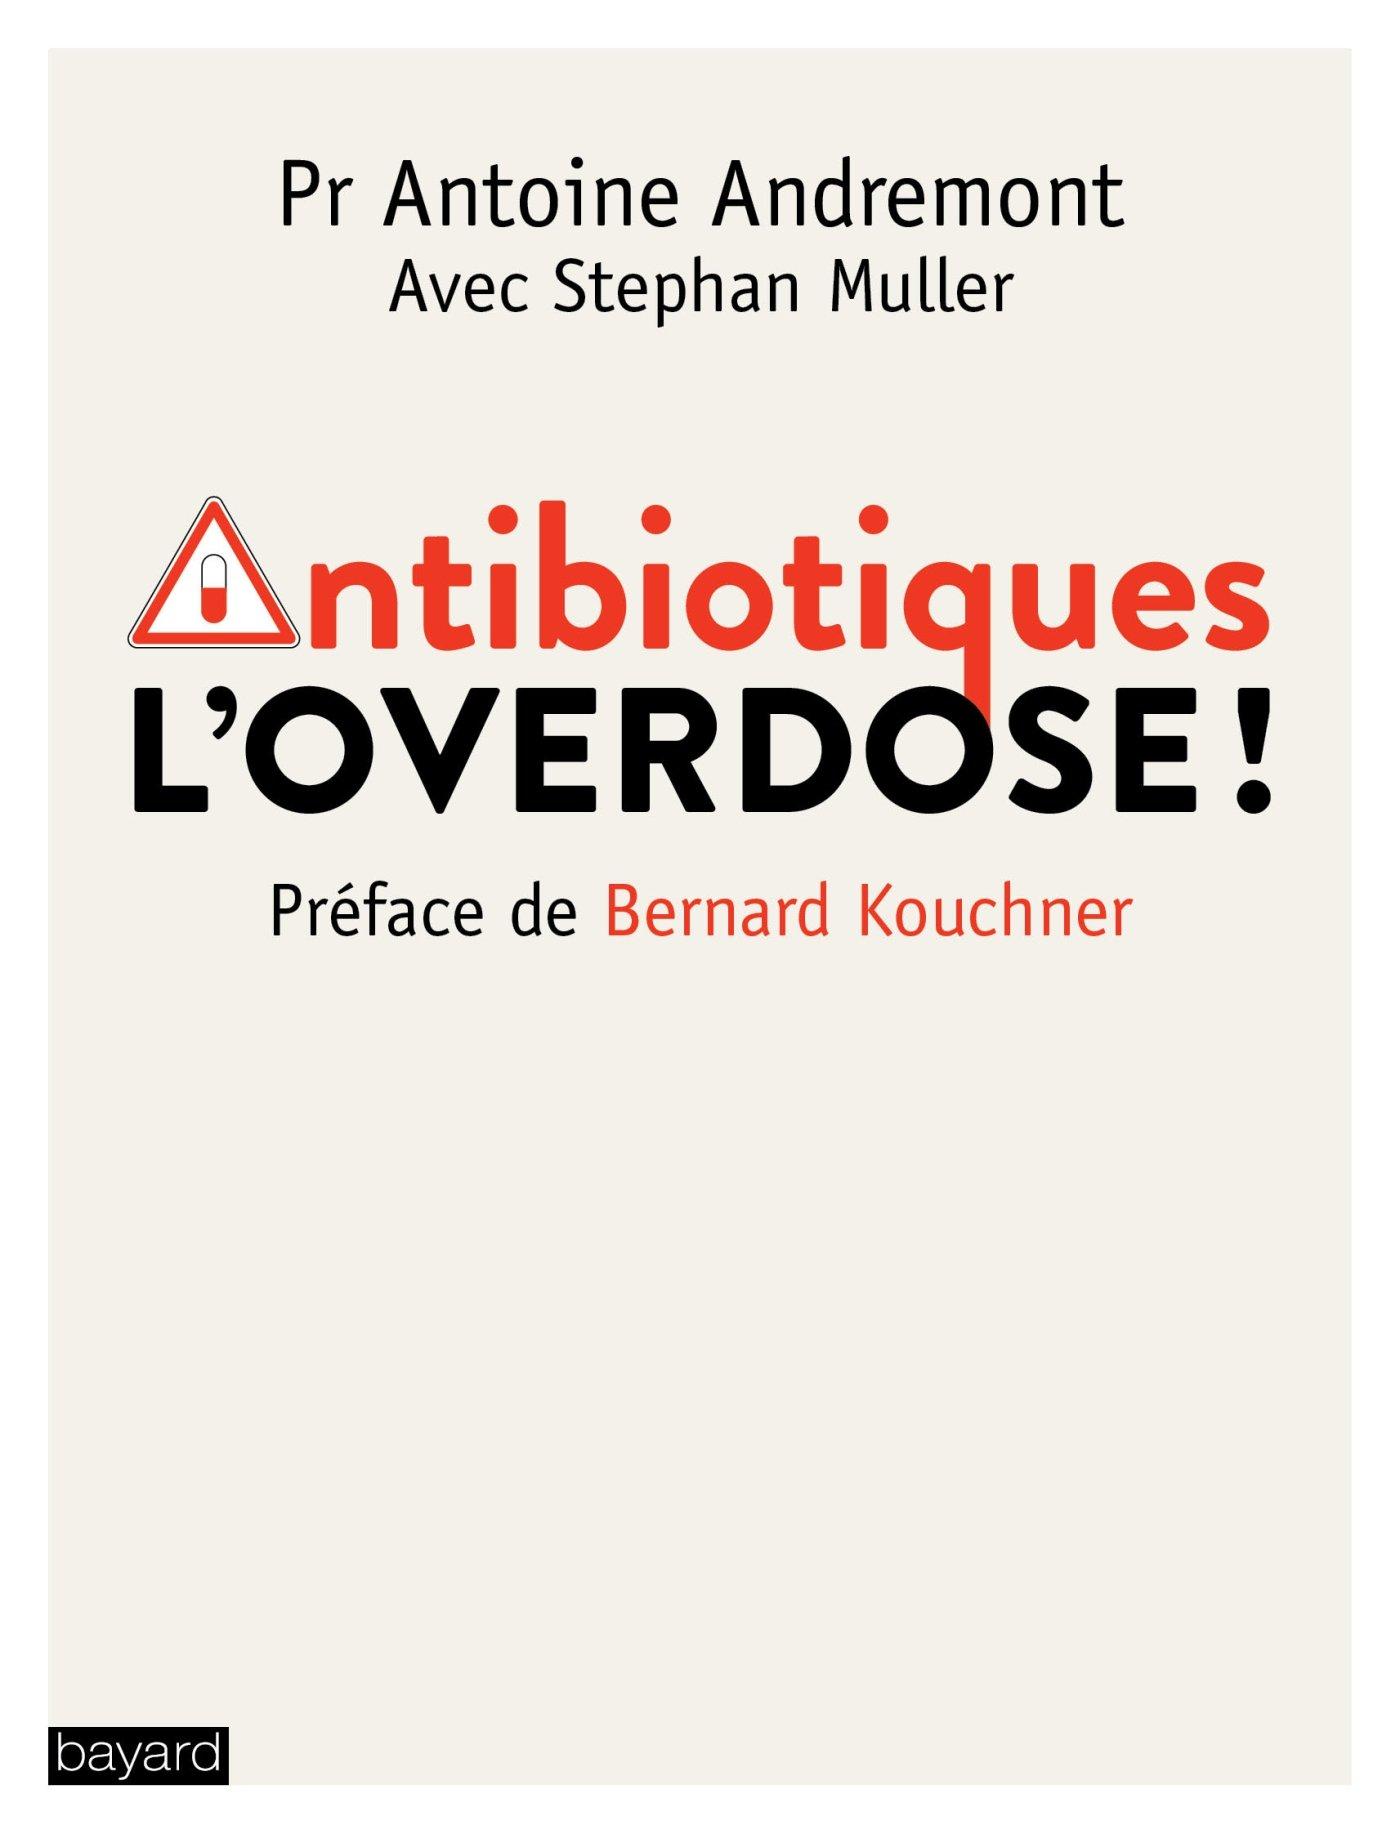 Antibiotiques_Overdose_GeekAnimea